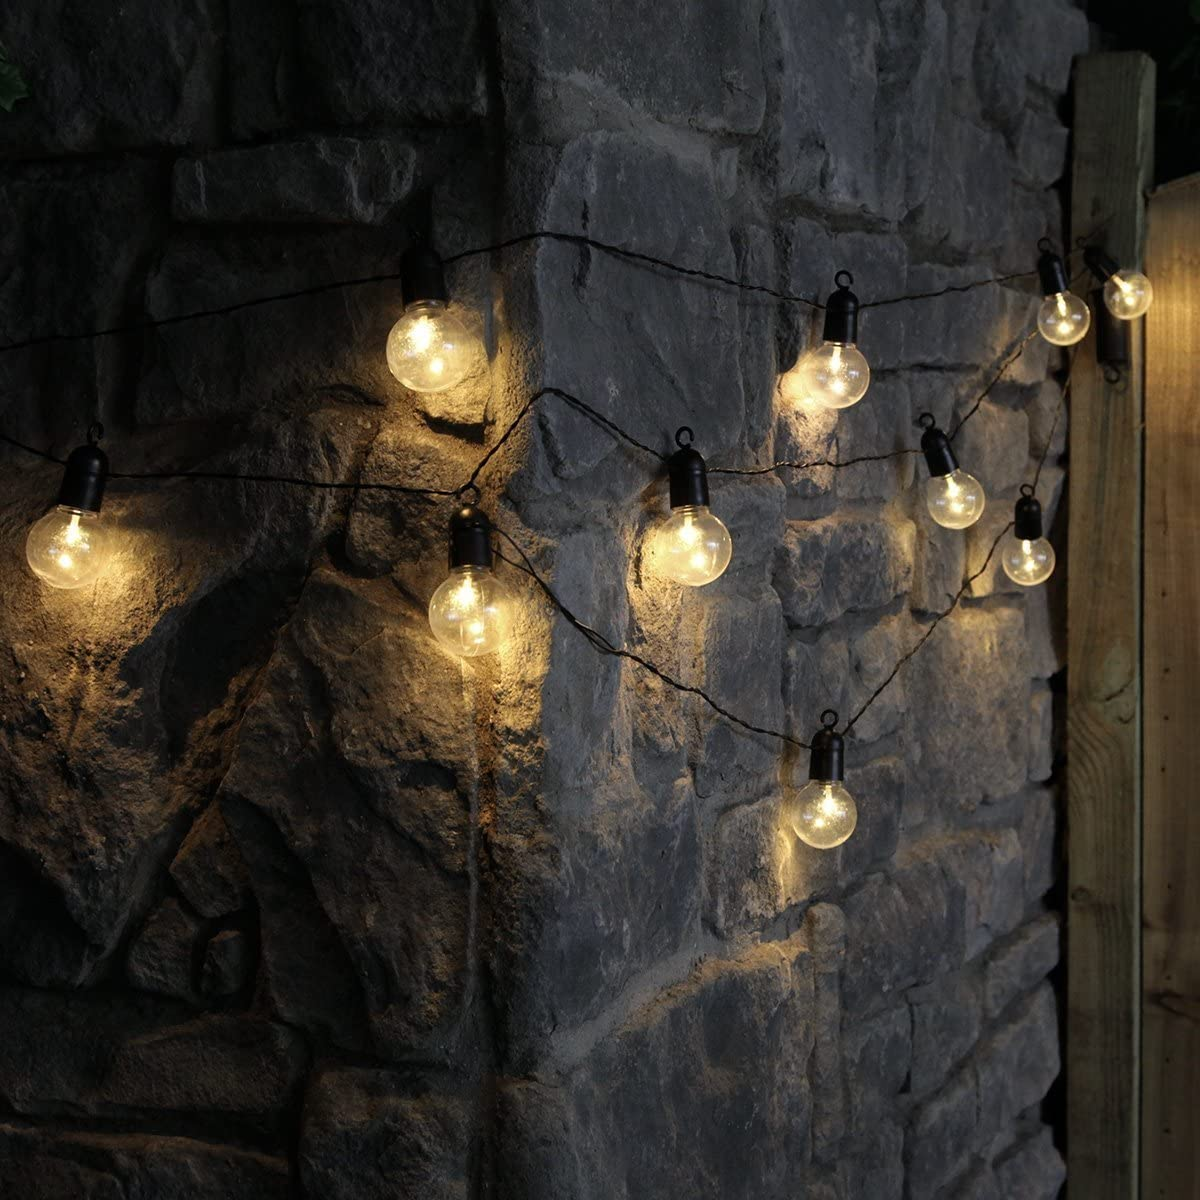 Matrimonio Natale Giardino LE Lampadina Catena Luminosa,DINOWIN 20ft 20 LED Bulbi Luci Batteria Stringa luminosa Decorative da Interni e Esterni per Festa bianca